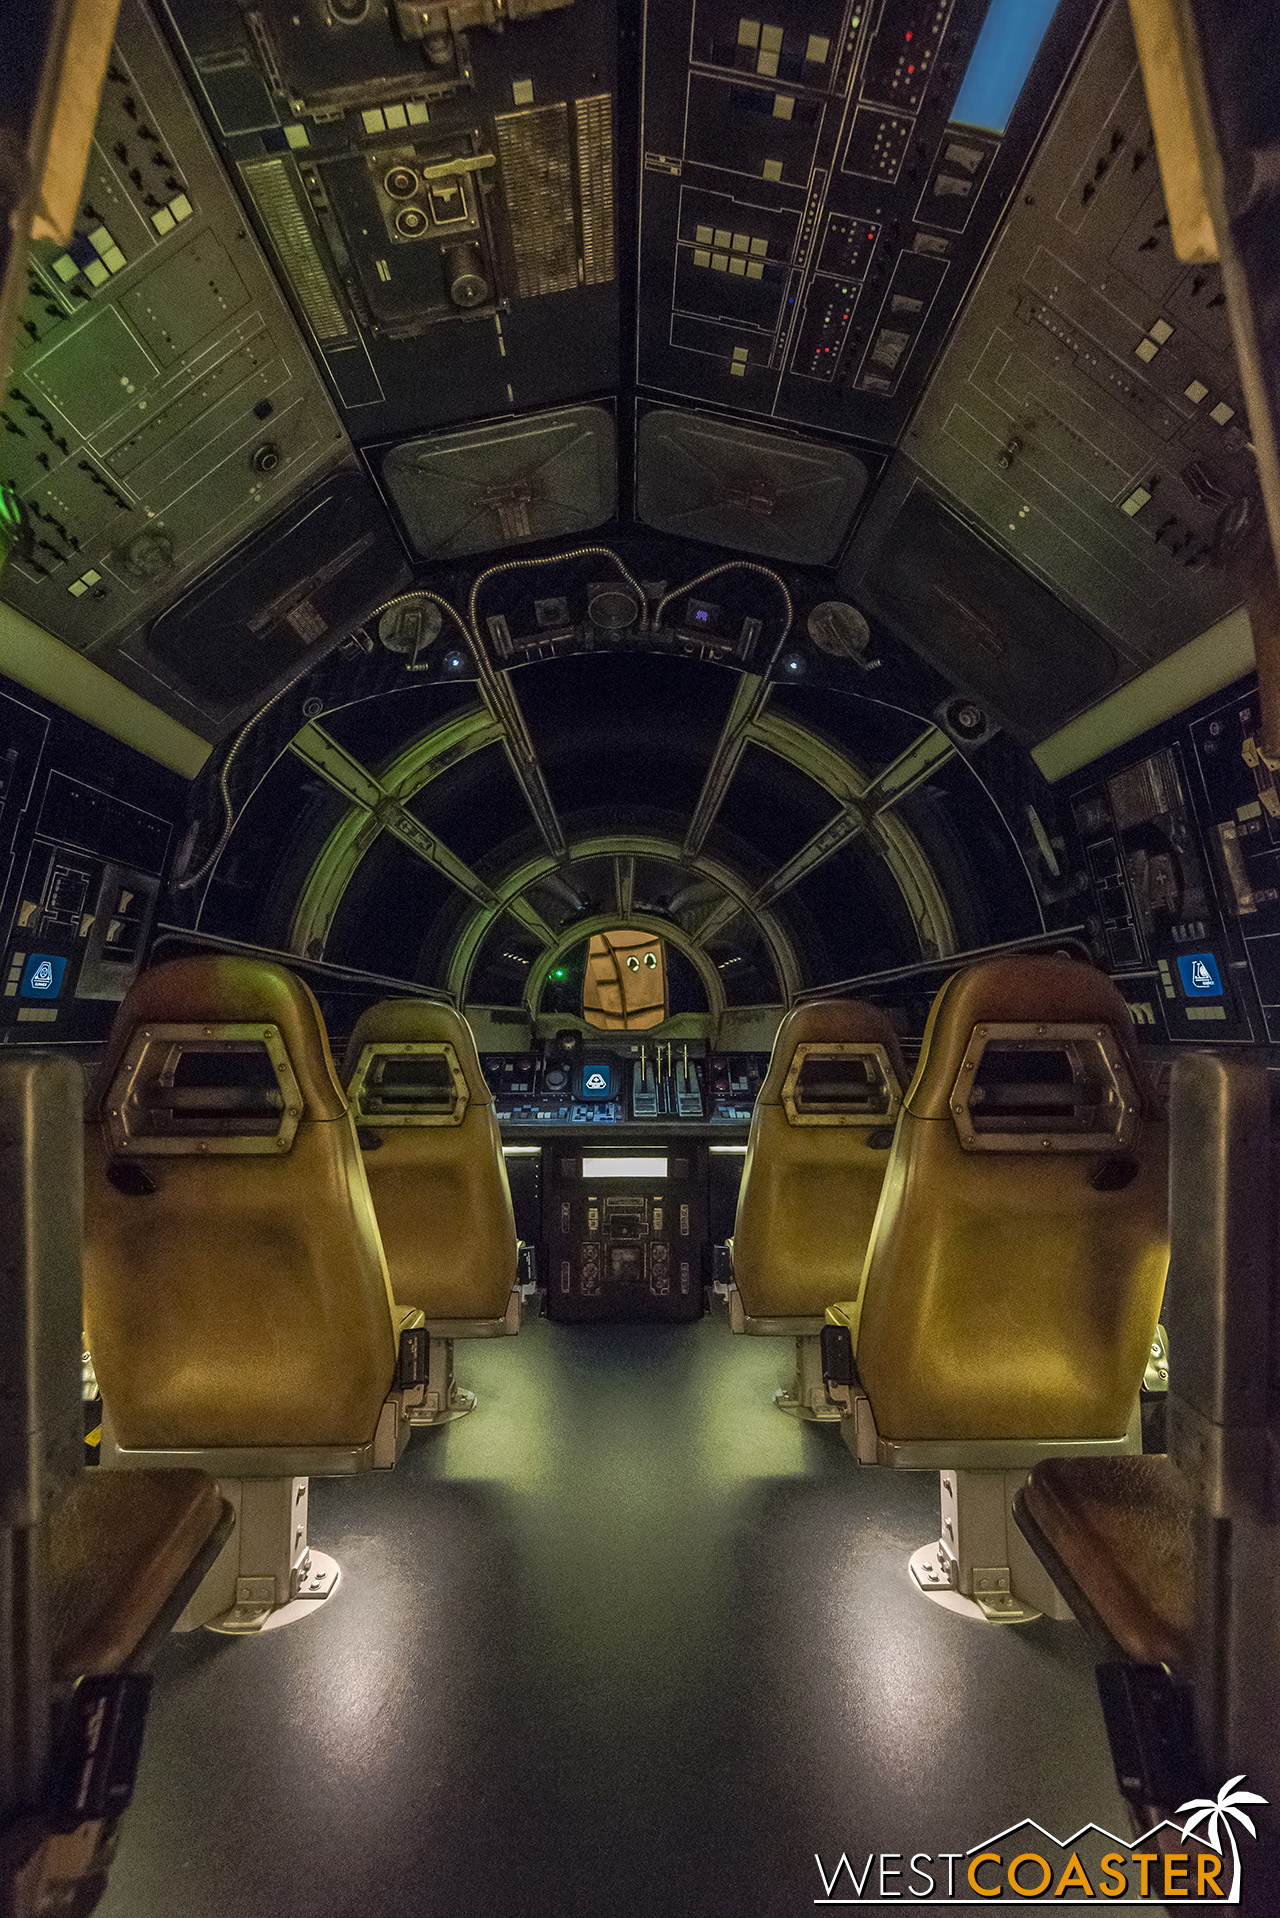 DLR-19_0606-D-Cockpit-0010.jpg